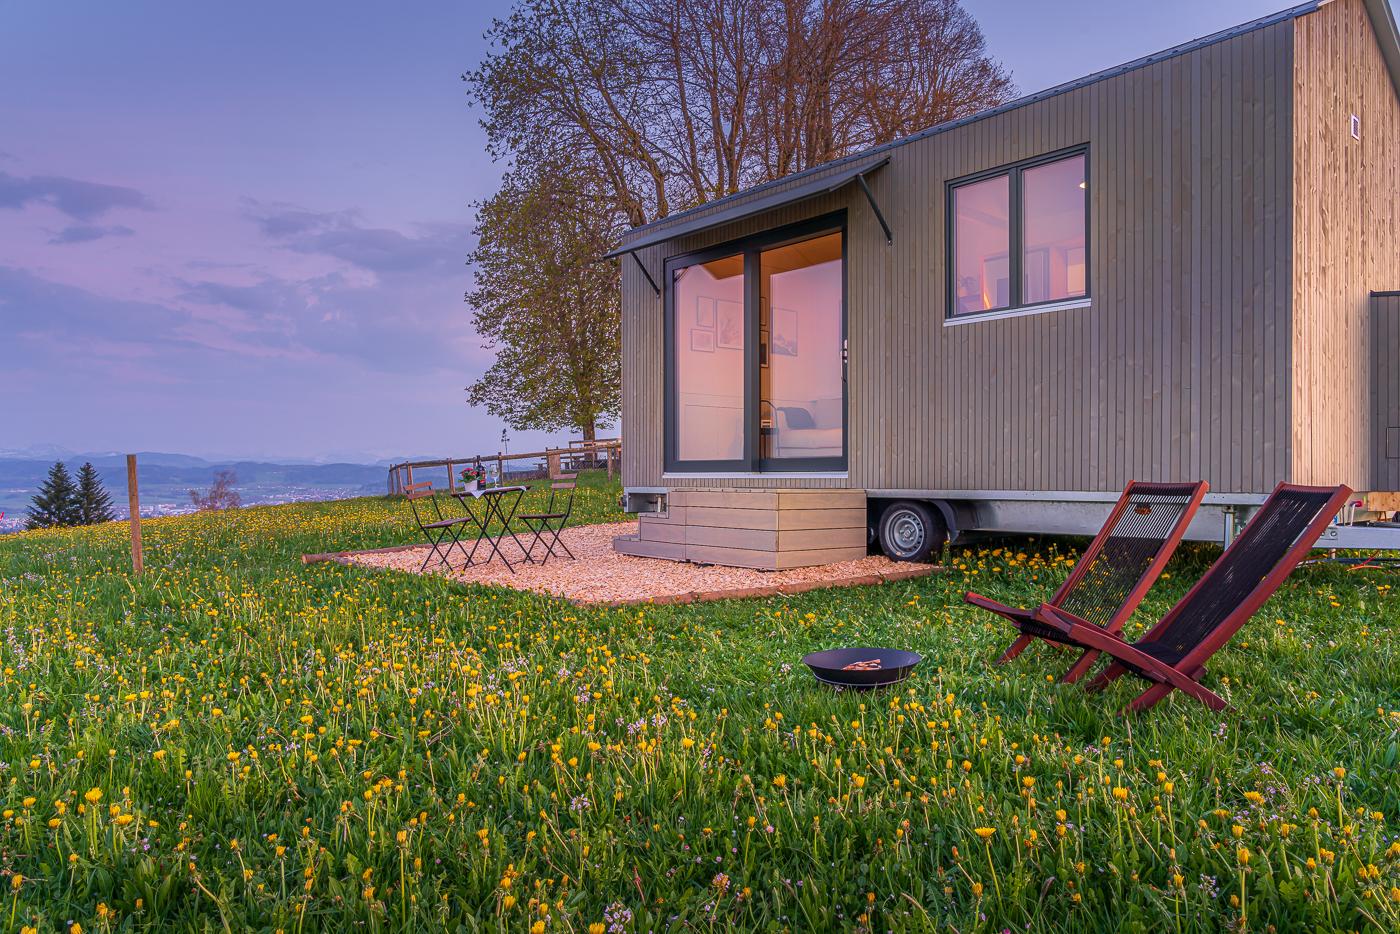 Tiny House auf dem Nollen im Kanton Thurgau